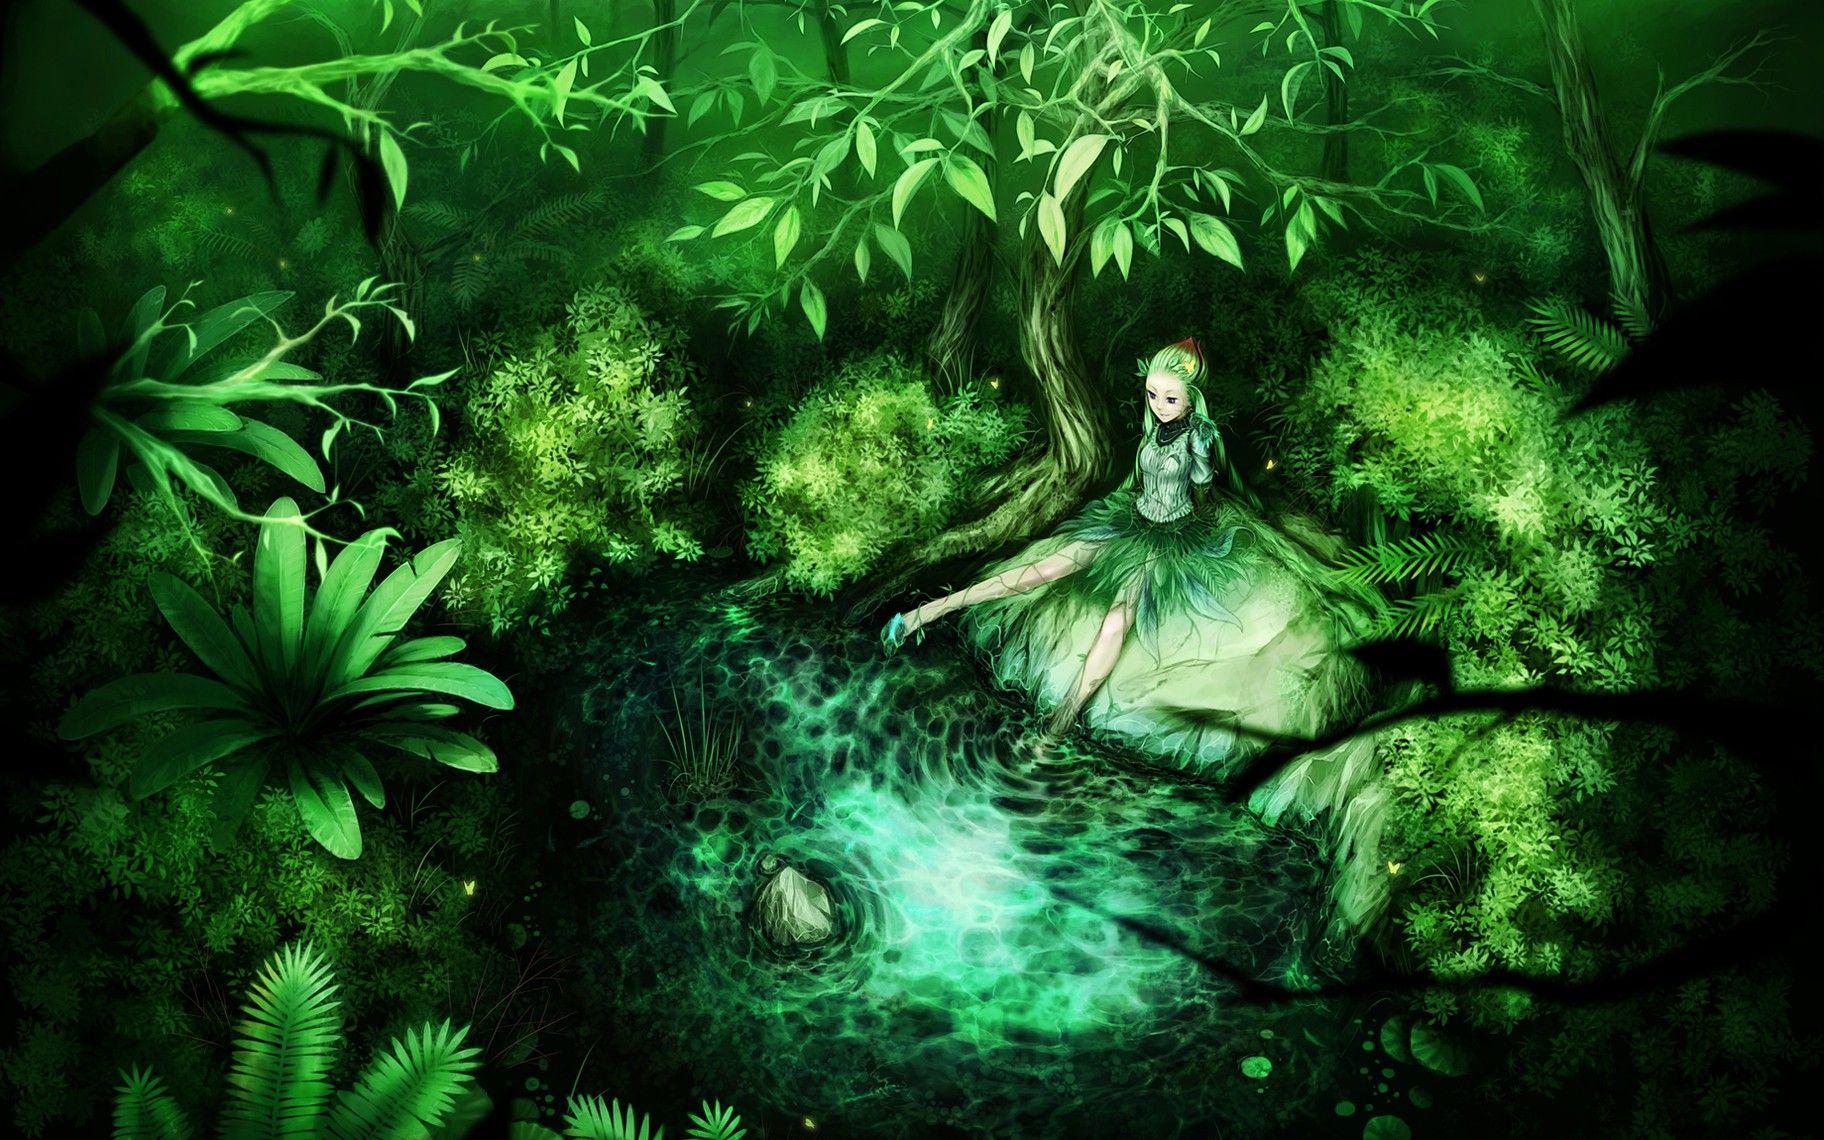 Green Anime Wallpaper In 2020 Fairy Wallpaper Fantasy Girl Fantasy Posters